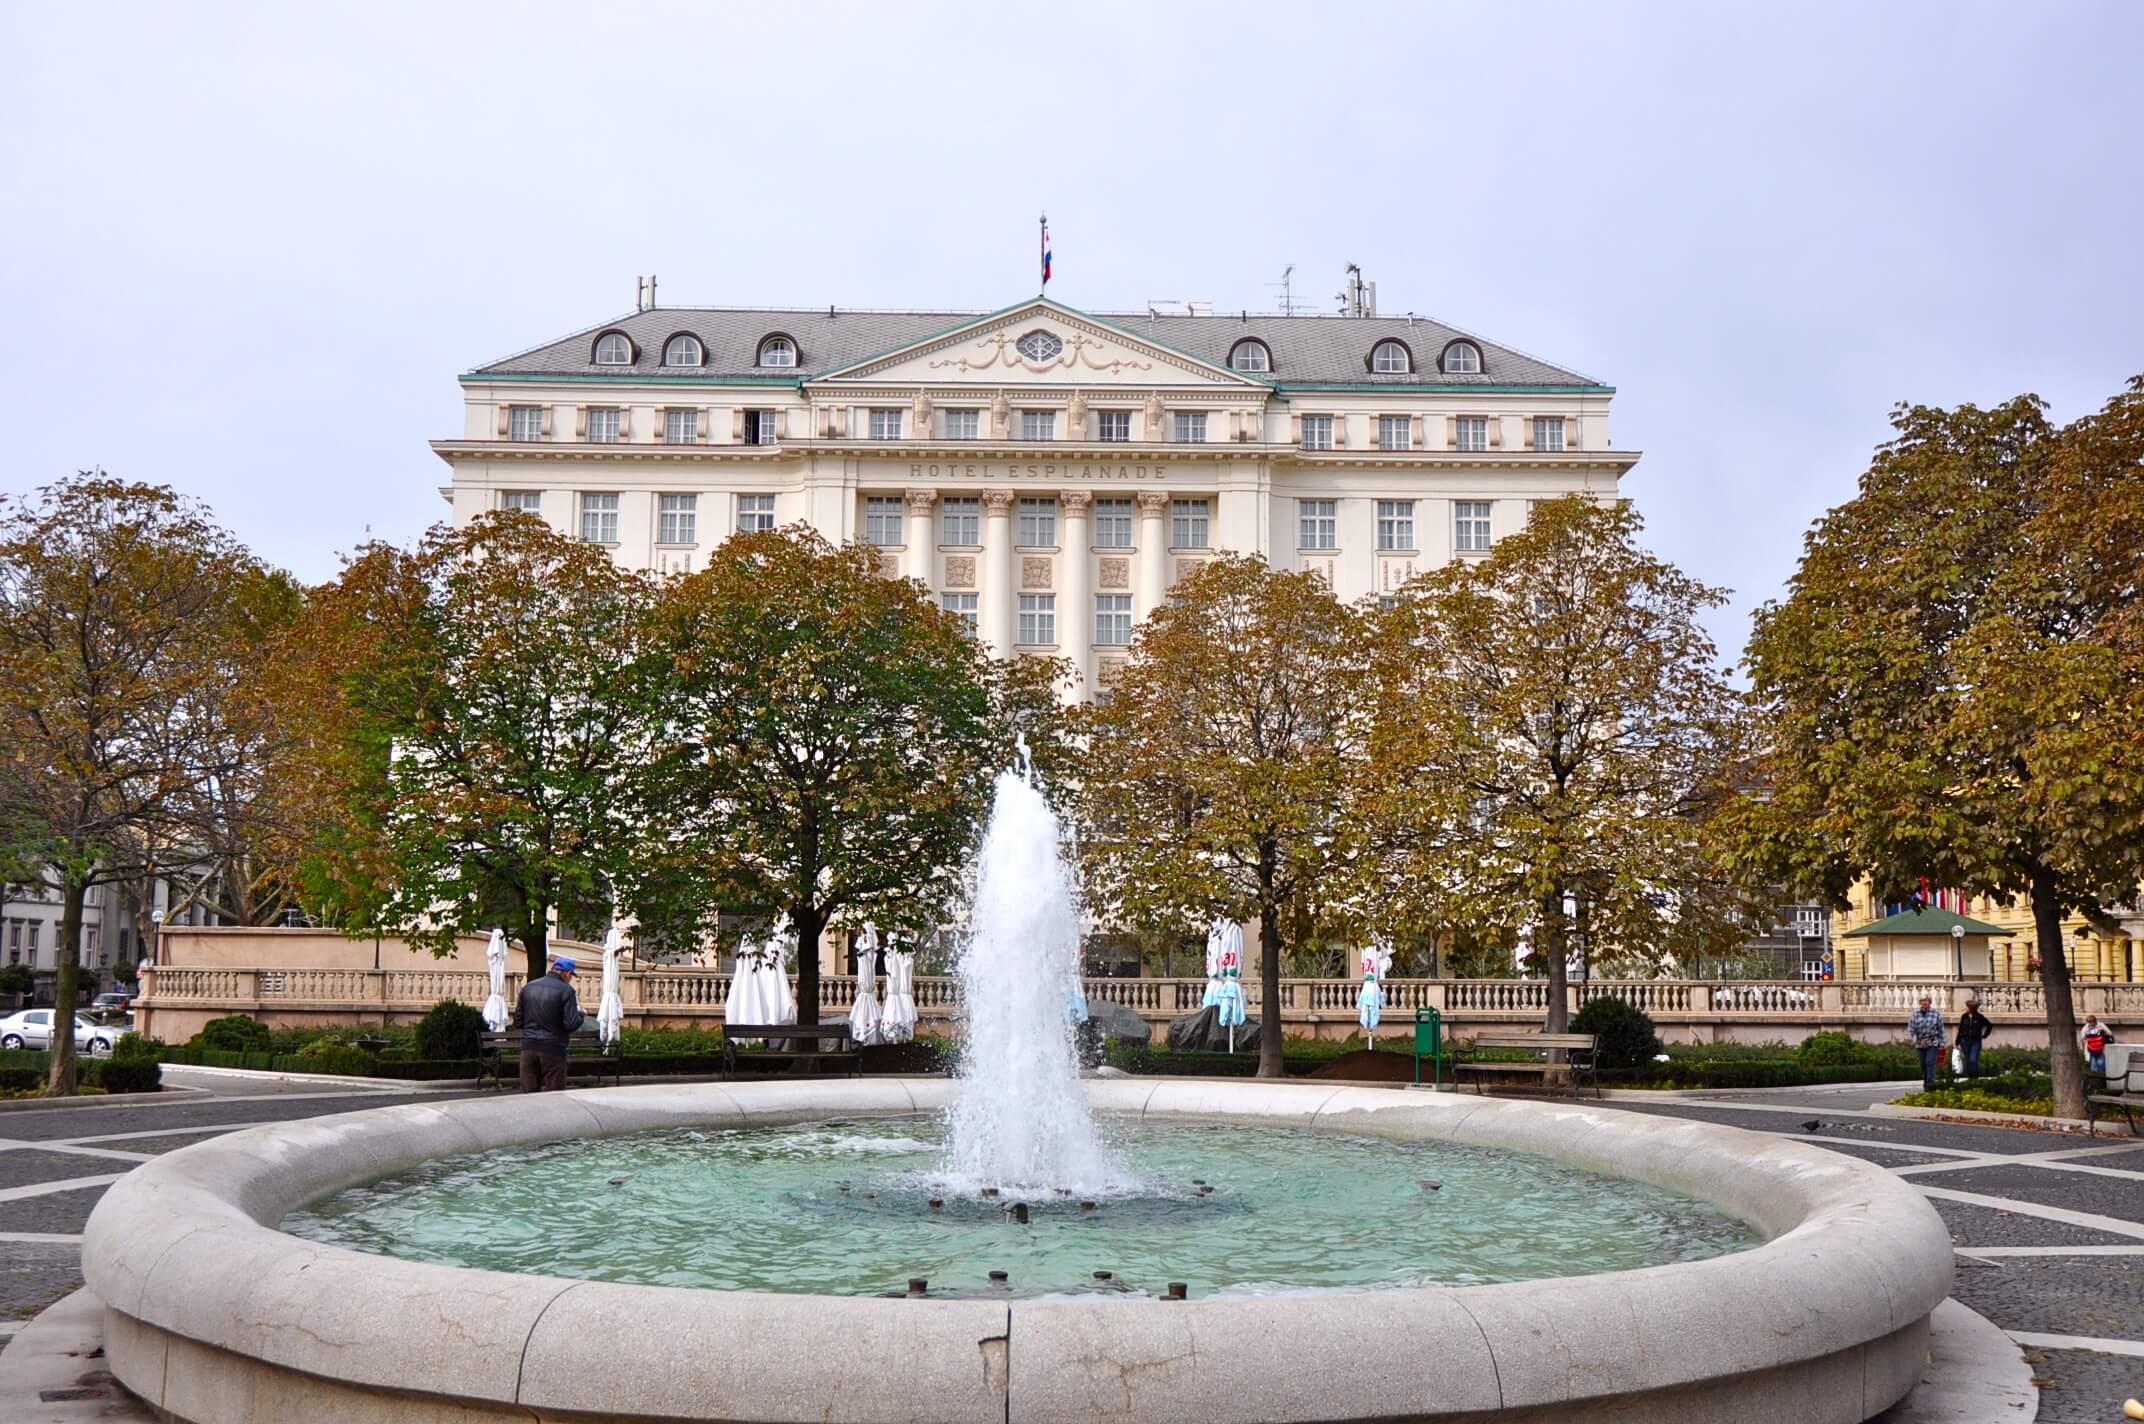 The Regent Esplanade Hotel